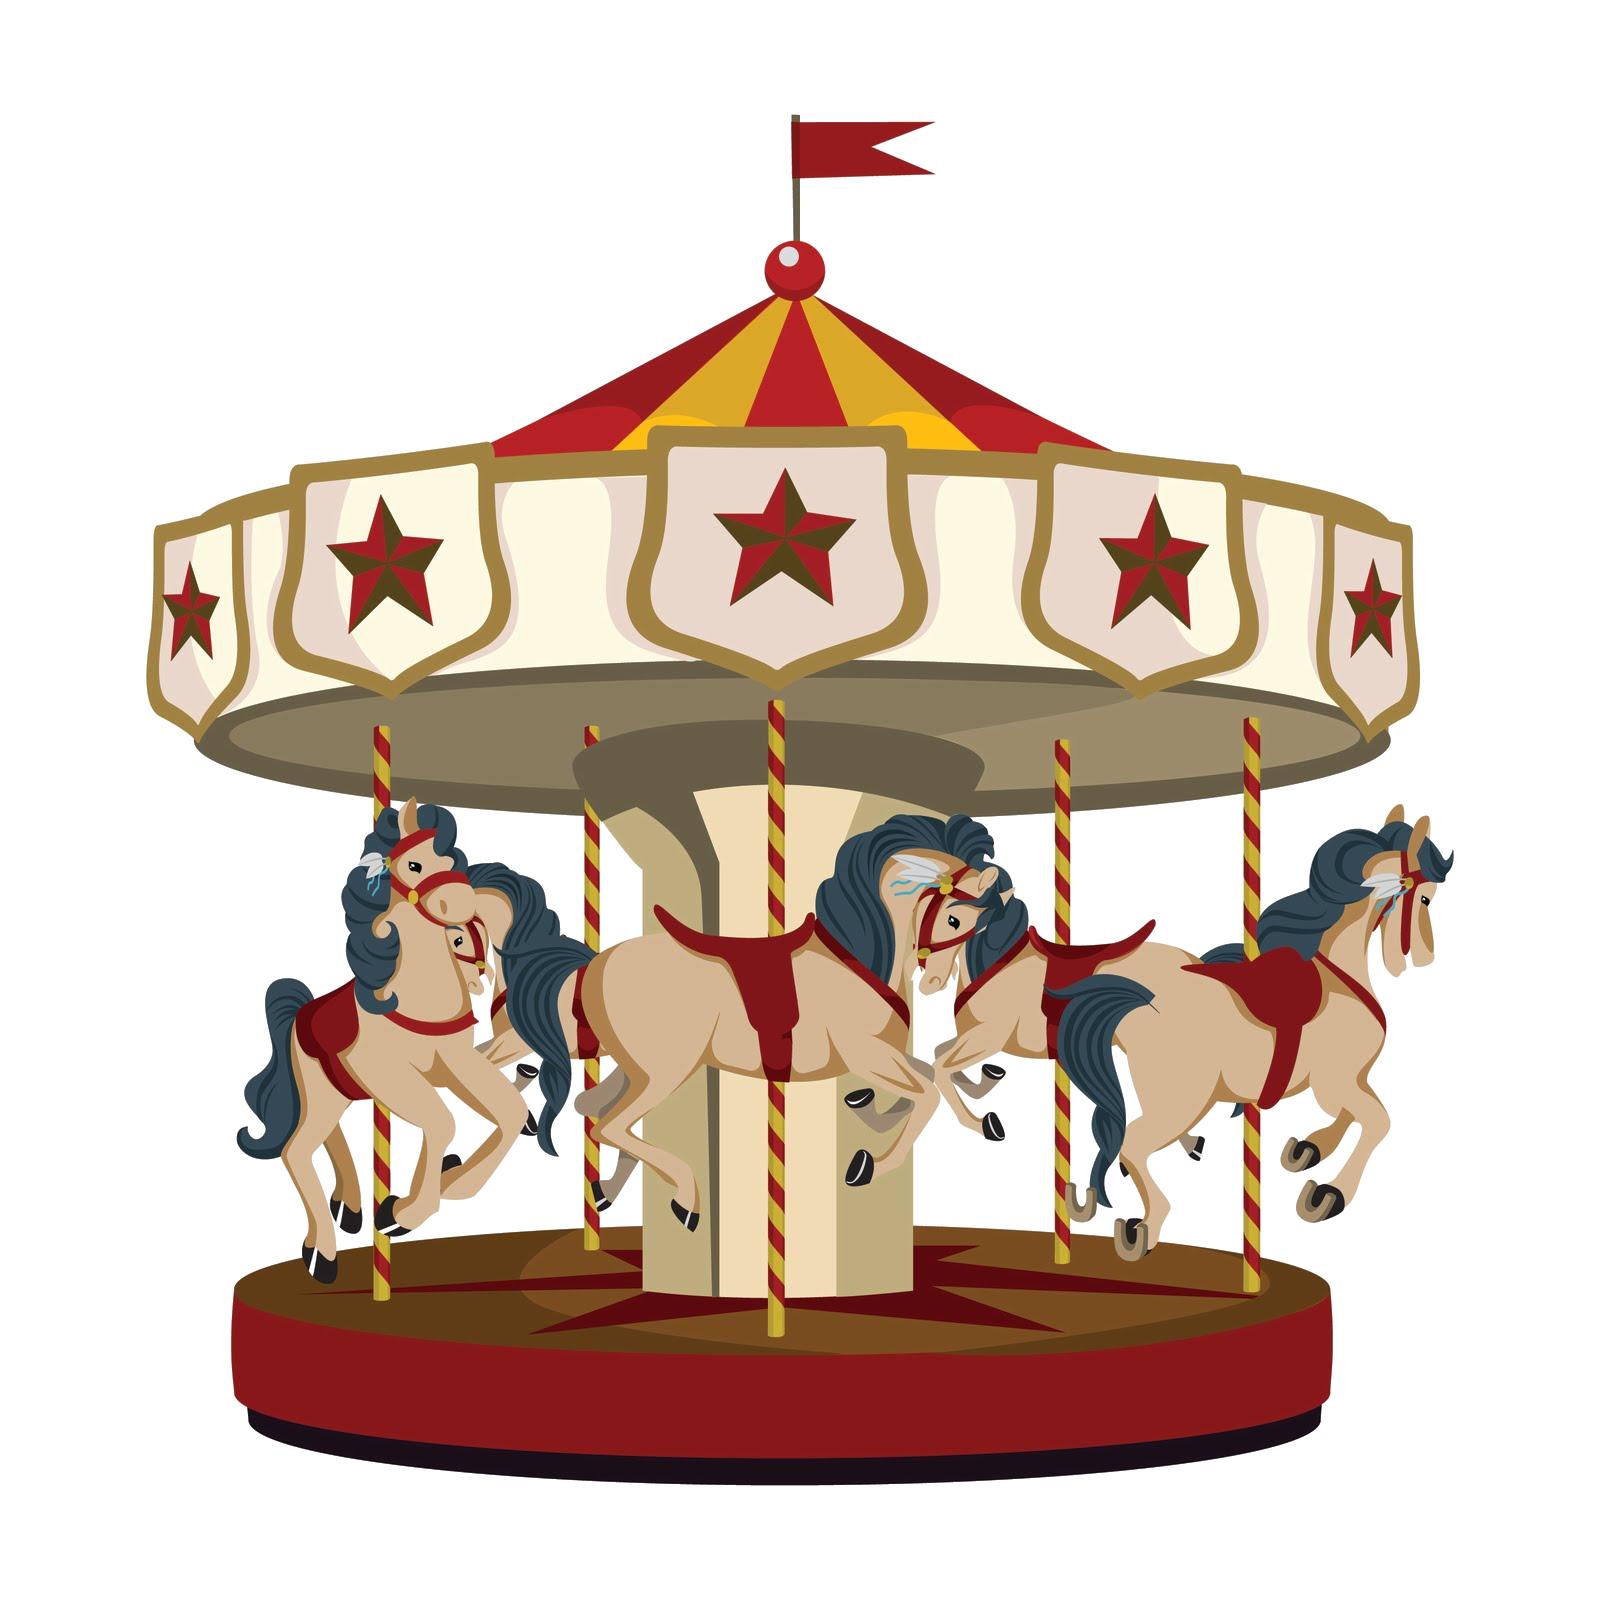 Carousel PNG Image.